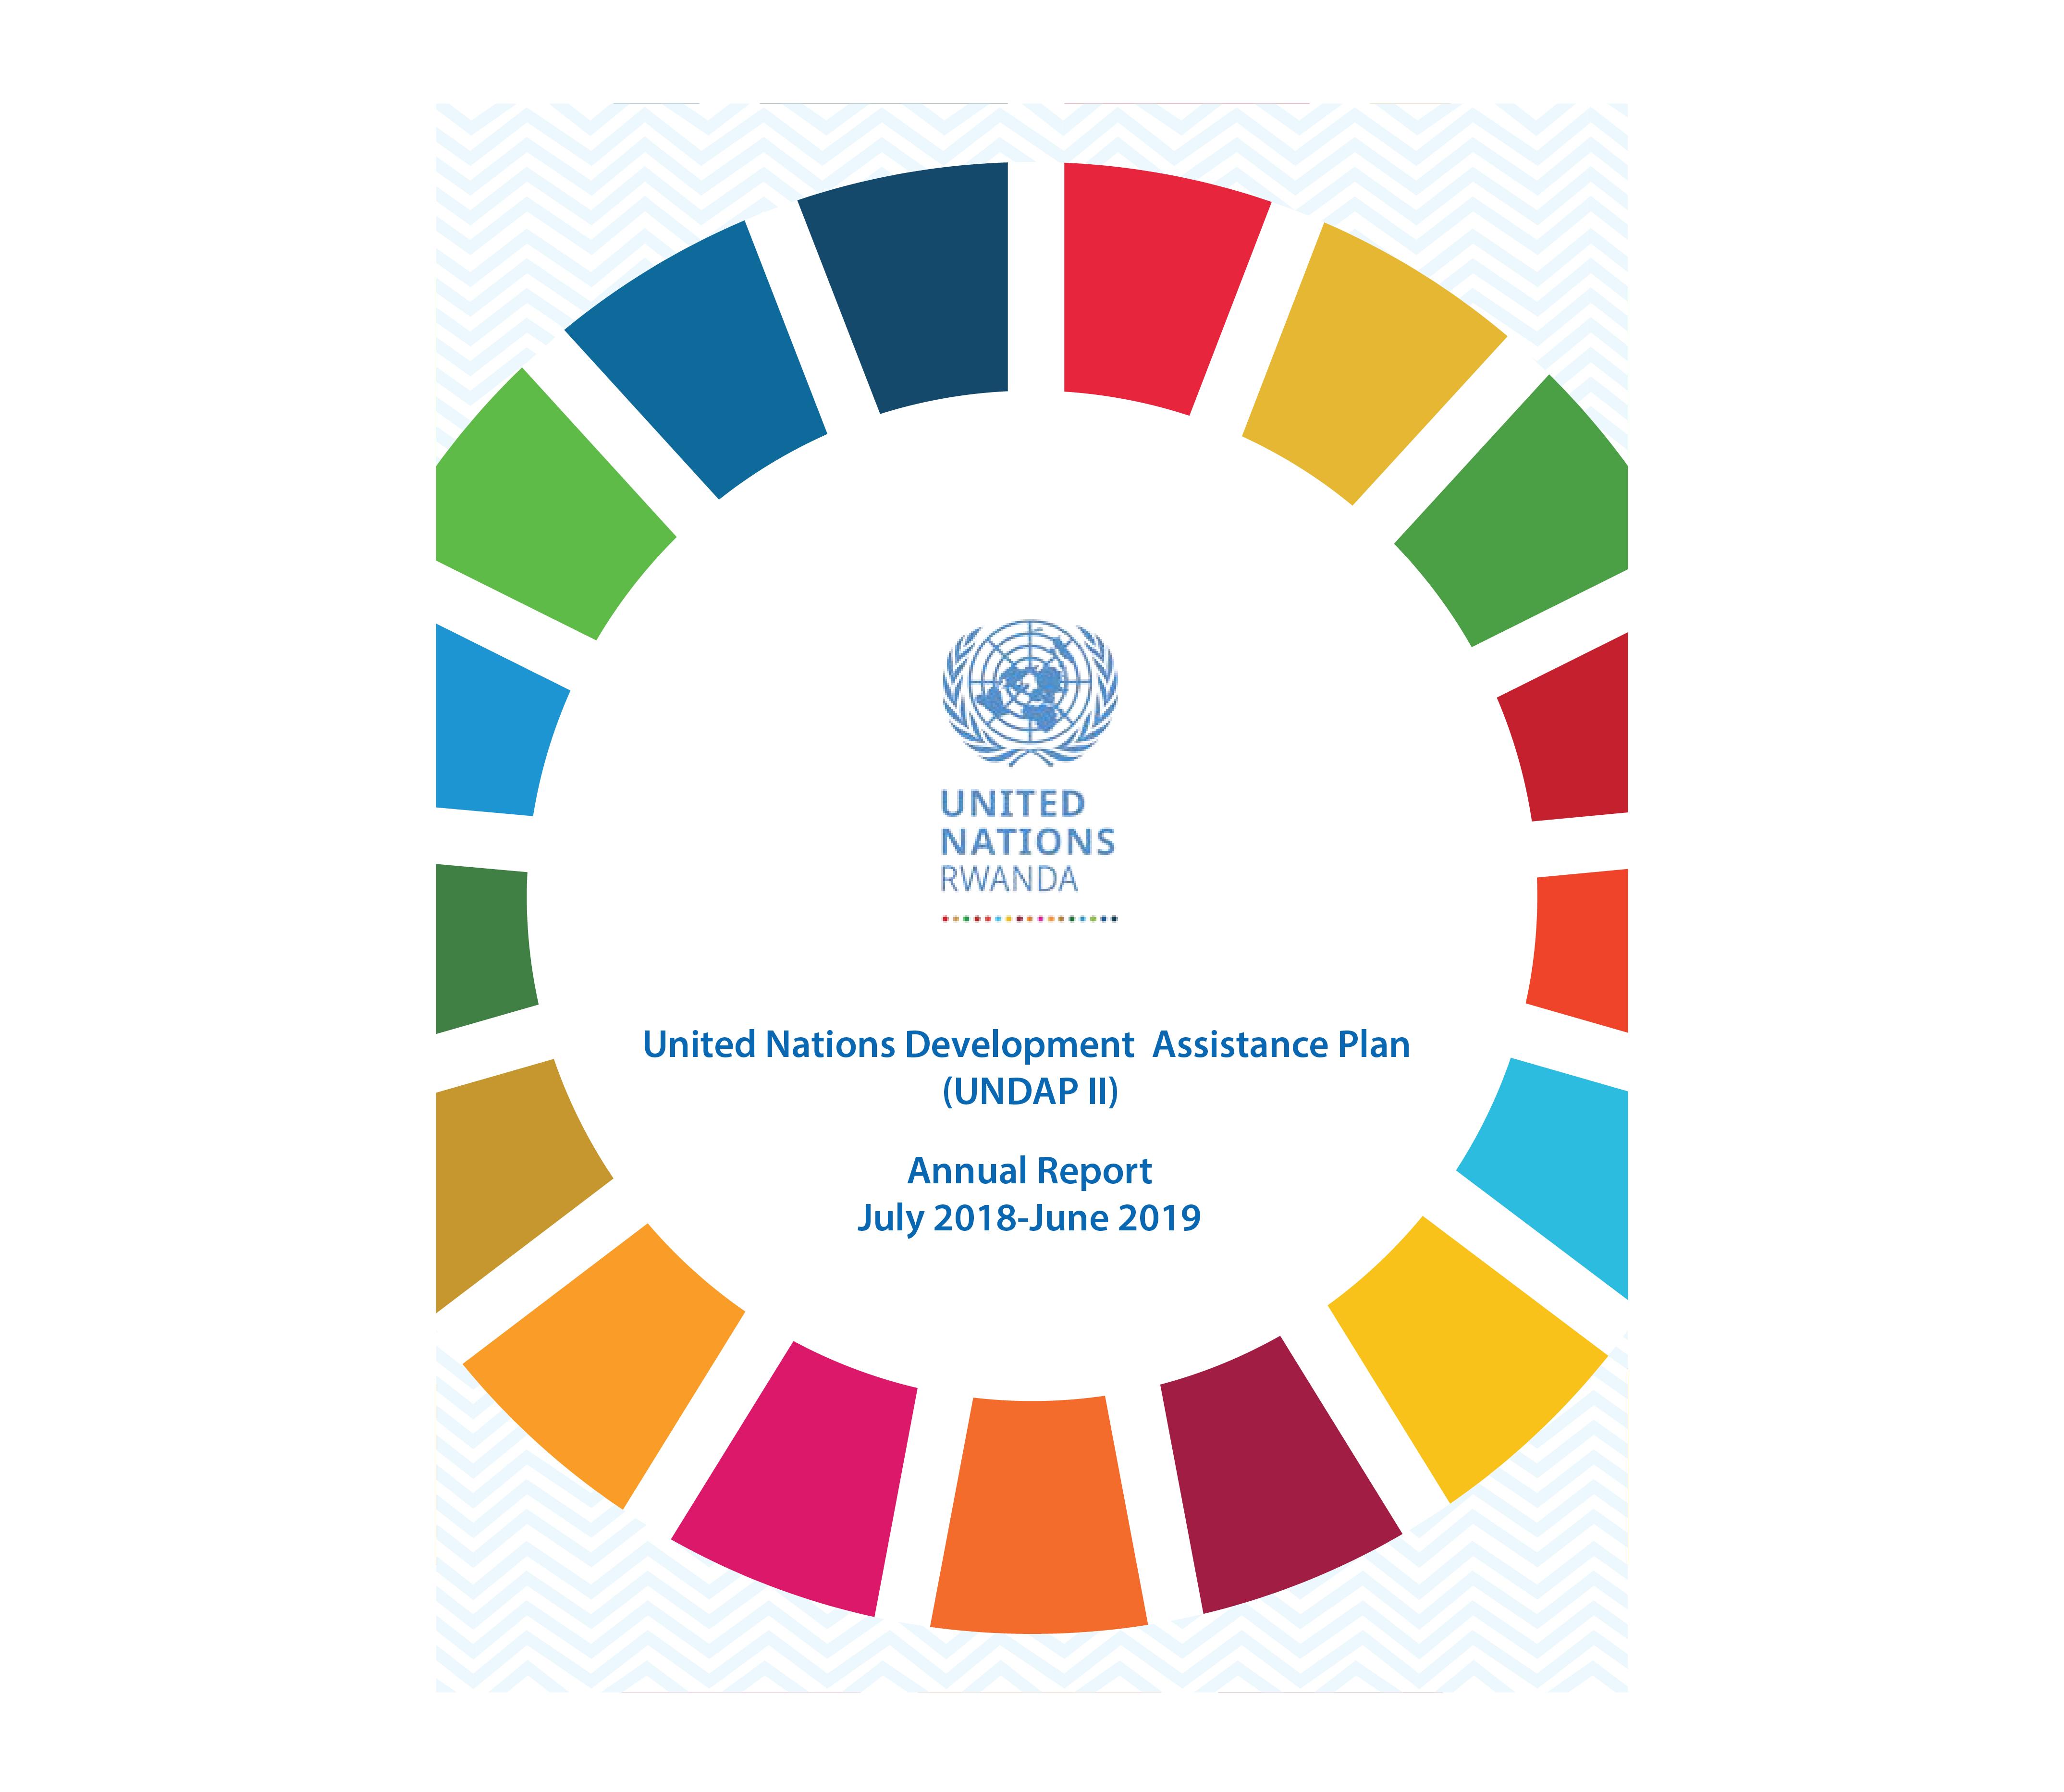 United Nations Development Assistance Plan (UNDAP II) Annual Report. June 2018 - July 2019